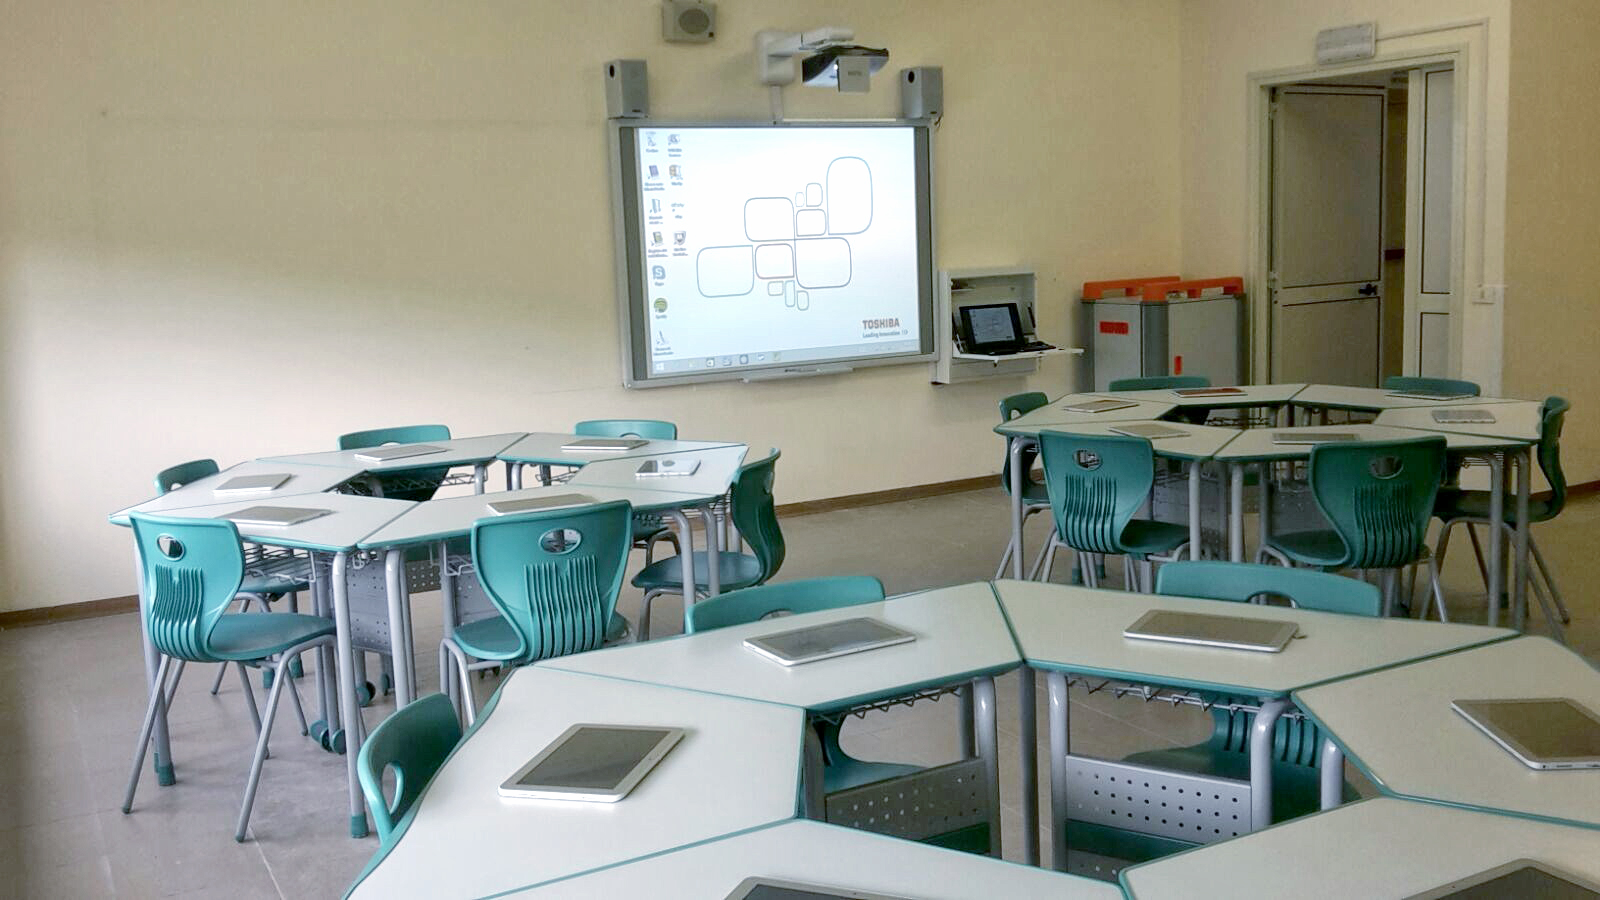 L'Aula 3.0 è realtà all'Istituto d'Istruzione Superiore via Gramsci